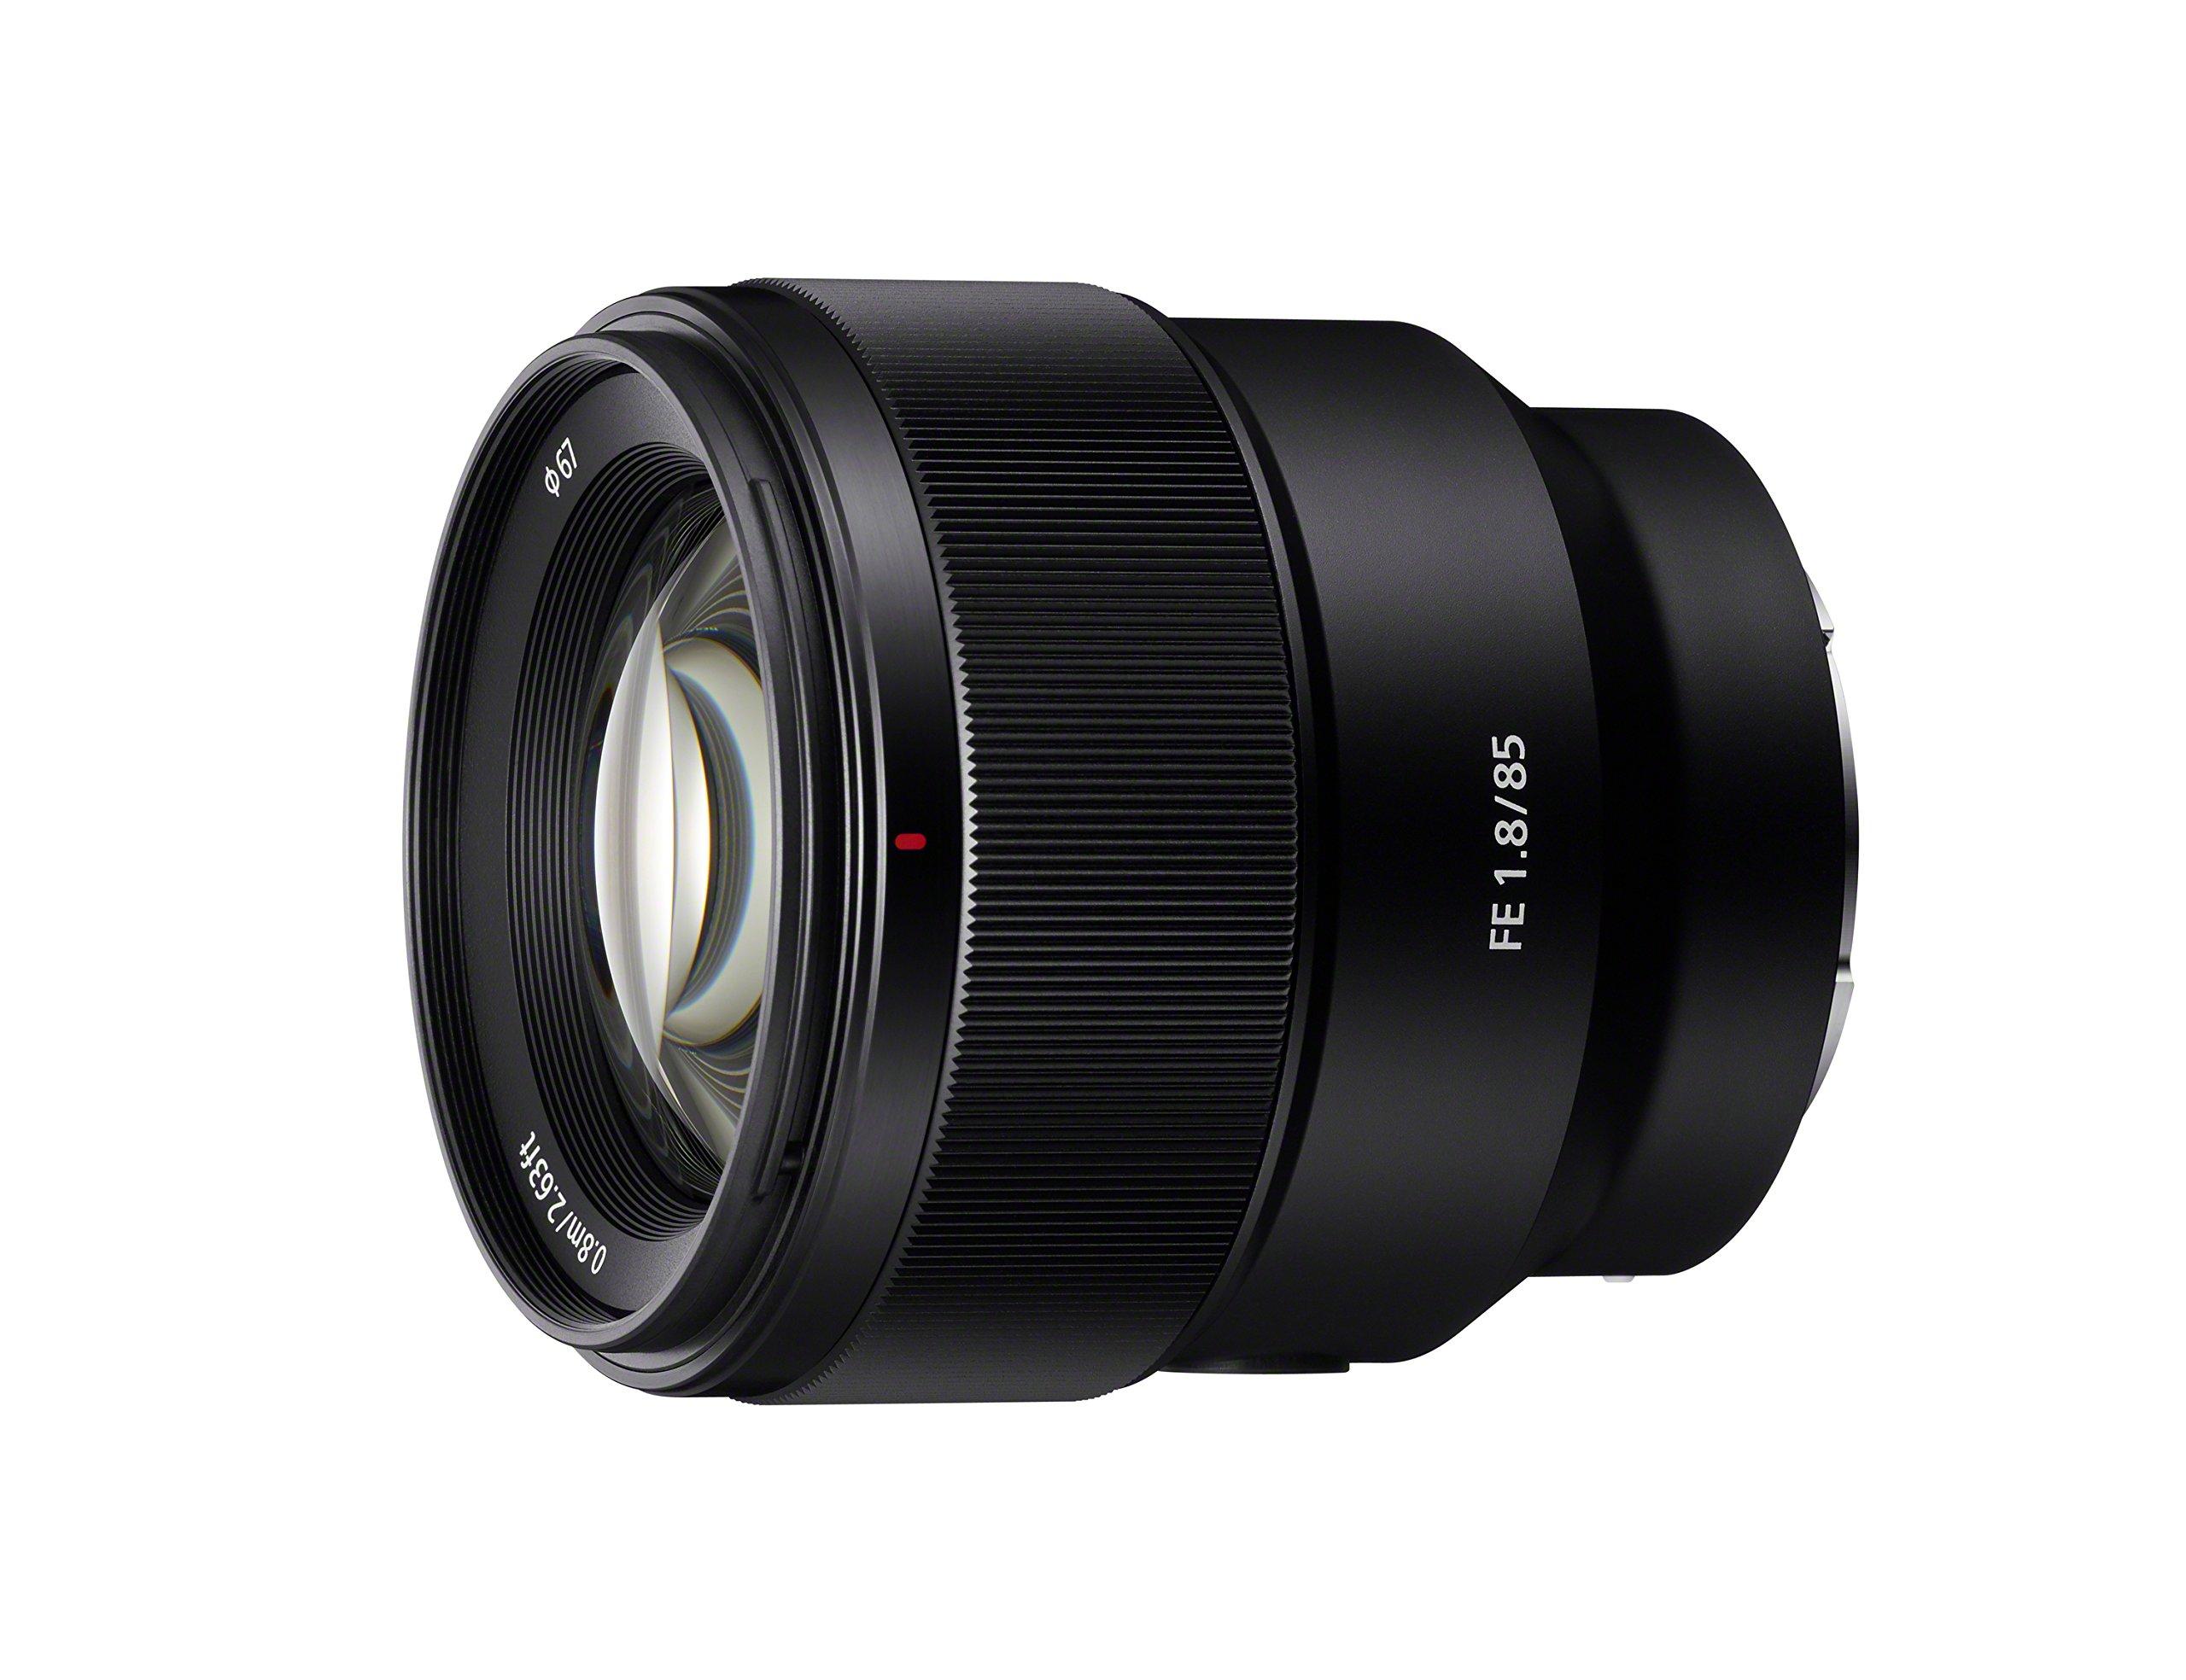 Sony SEL85F18 85mm F/1.8-22 Medium-Telephoto Fixed Prime Camera Lens, Black by Sony